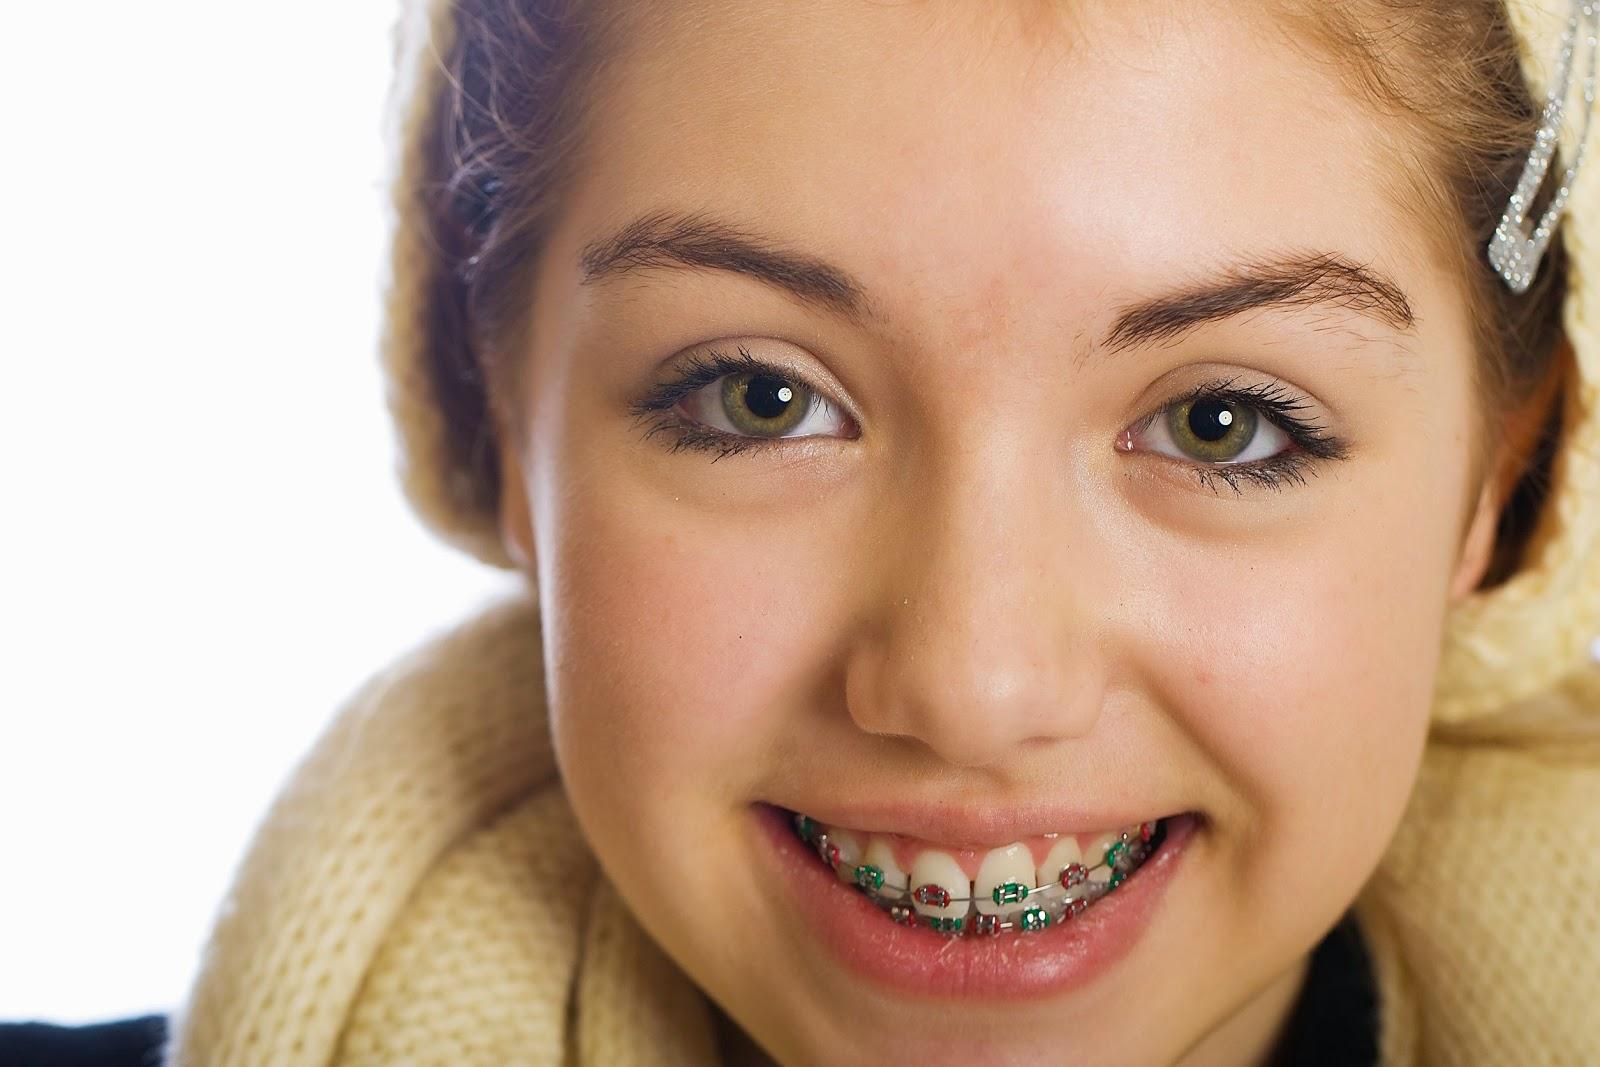 Promovago noviembre 2014 for W de porter ortodoncia